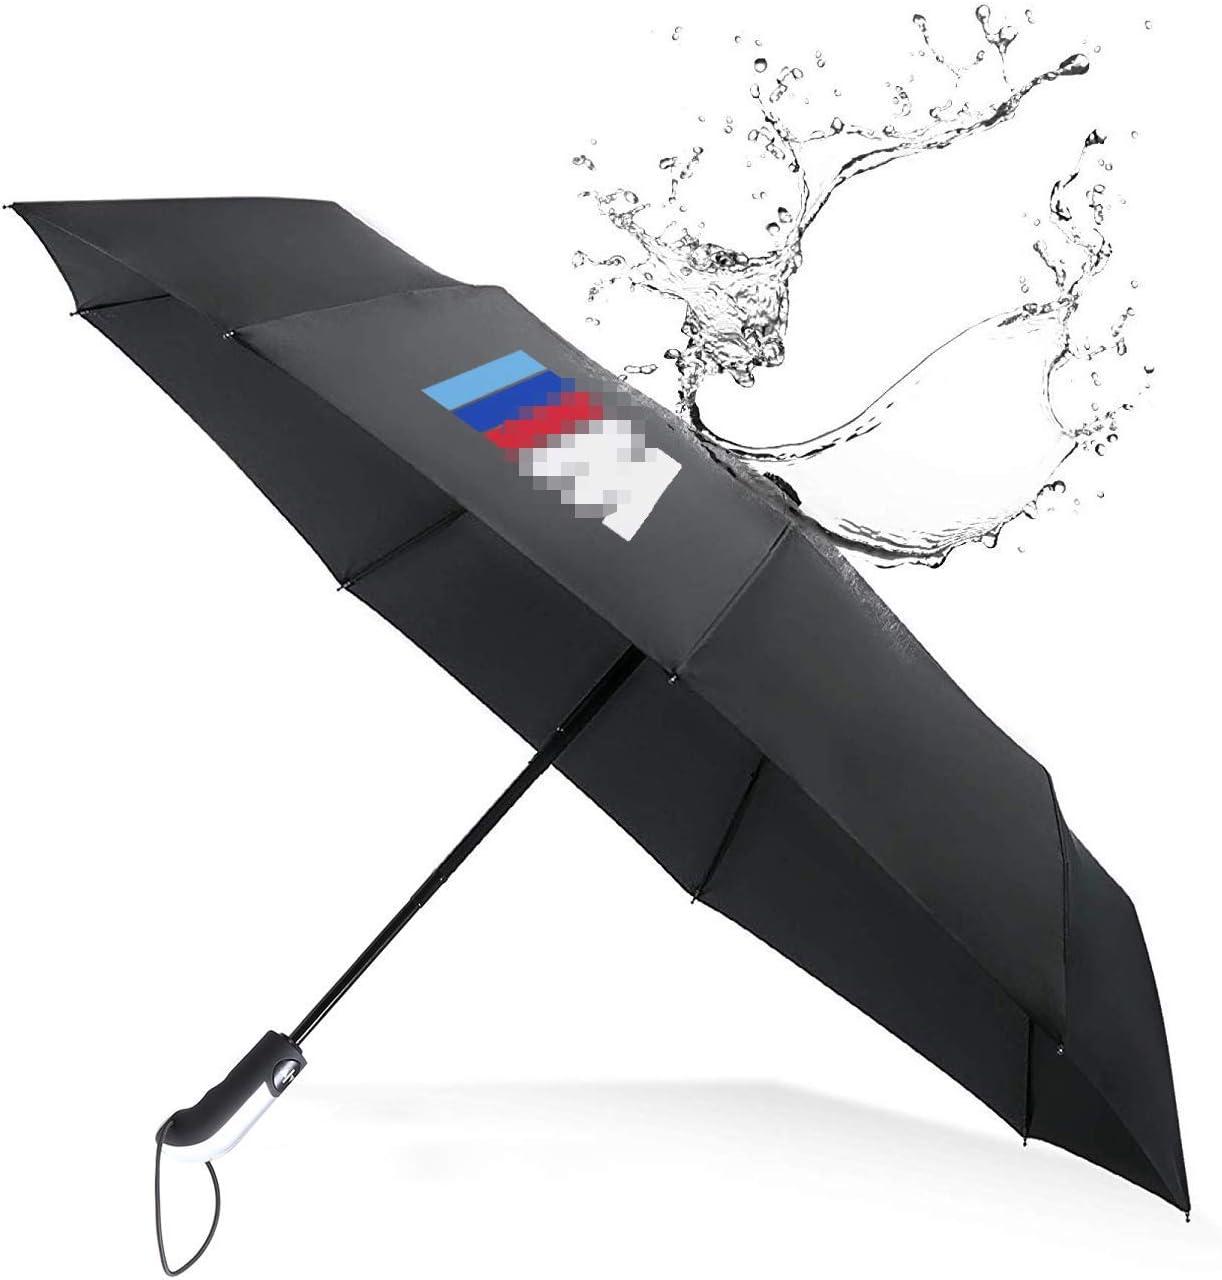 YIKA Paraguas Plegable para Deportes automáticos, Apertura automática, Resistente al Viento, para 3 m